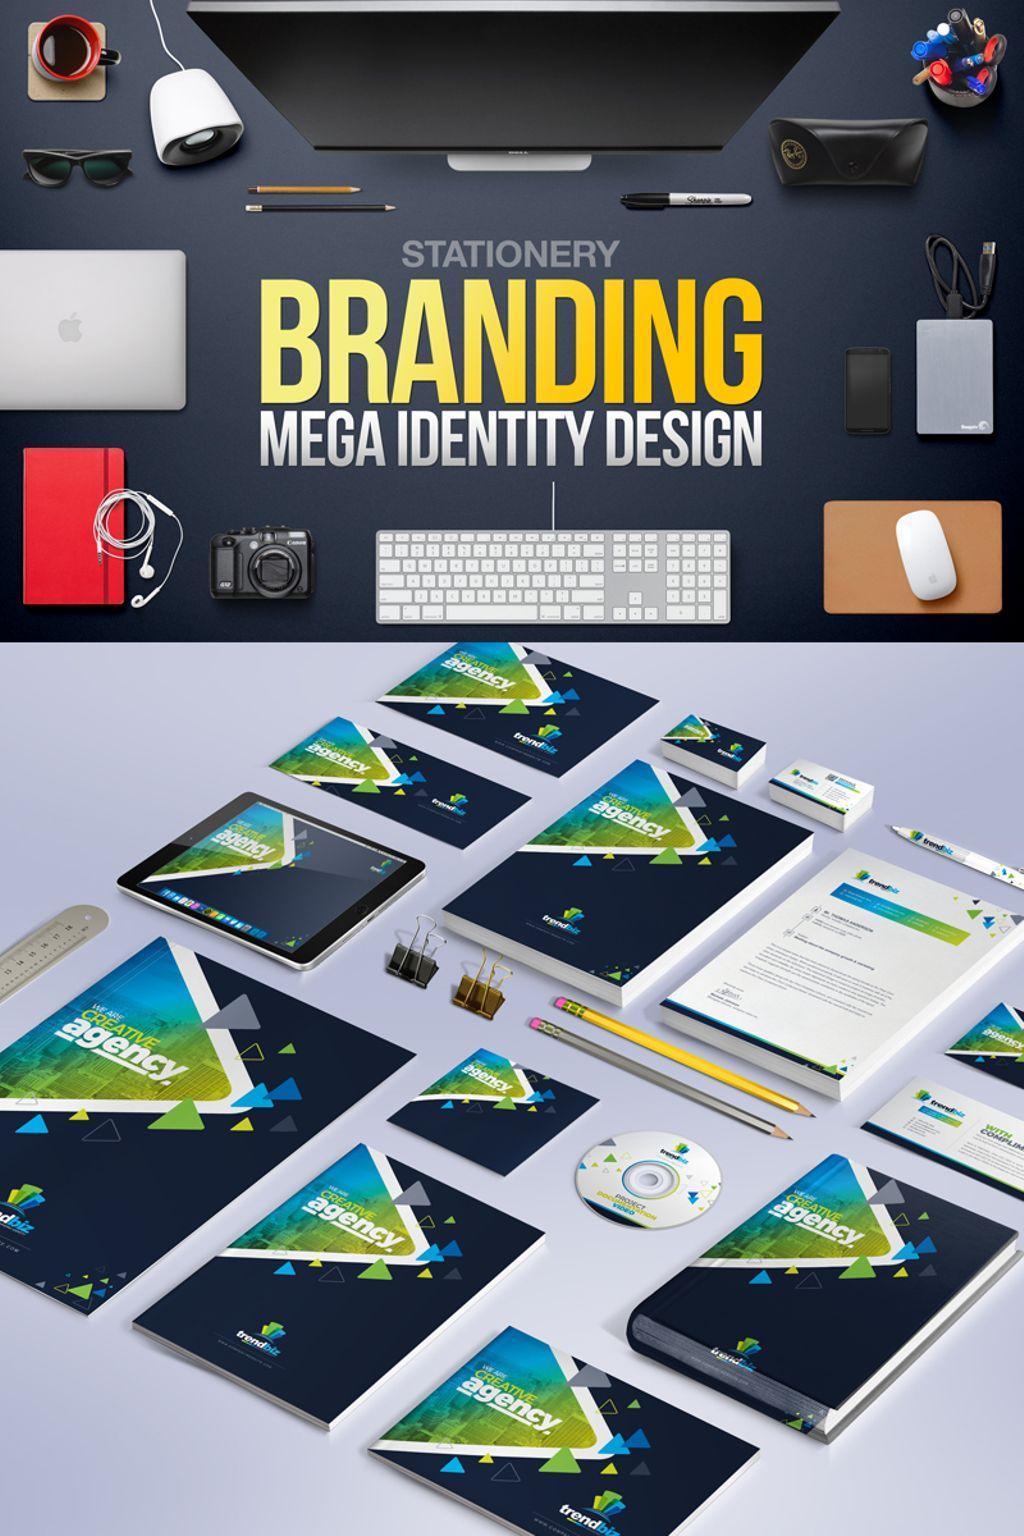 Stationery Branding Mega Identity Design Kurumsal Kimlik #67294